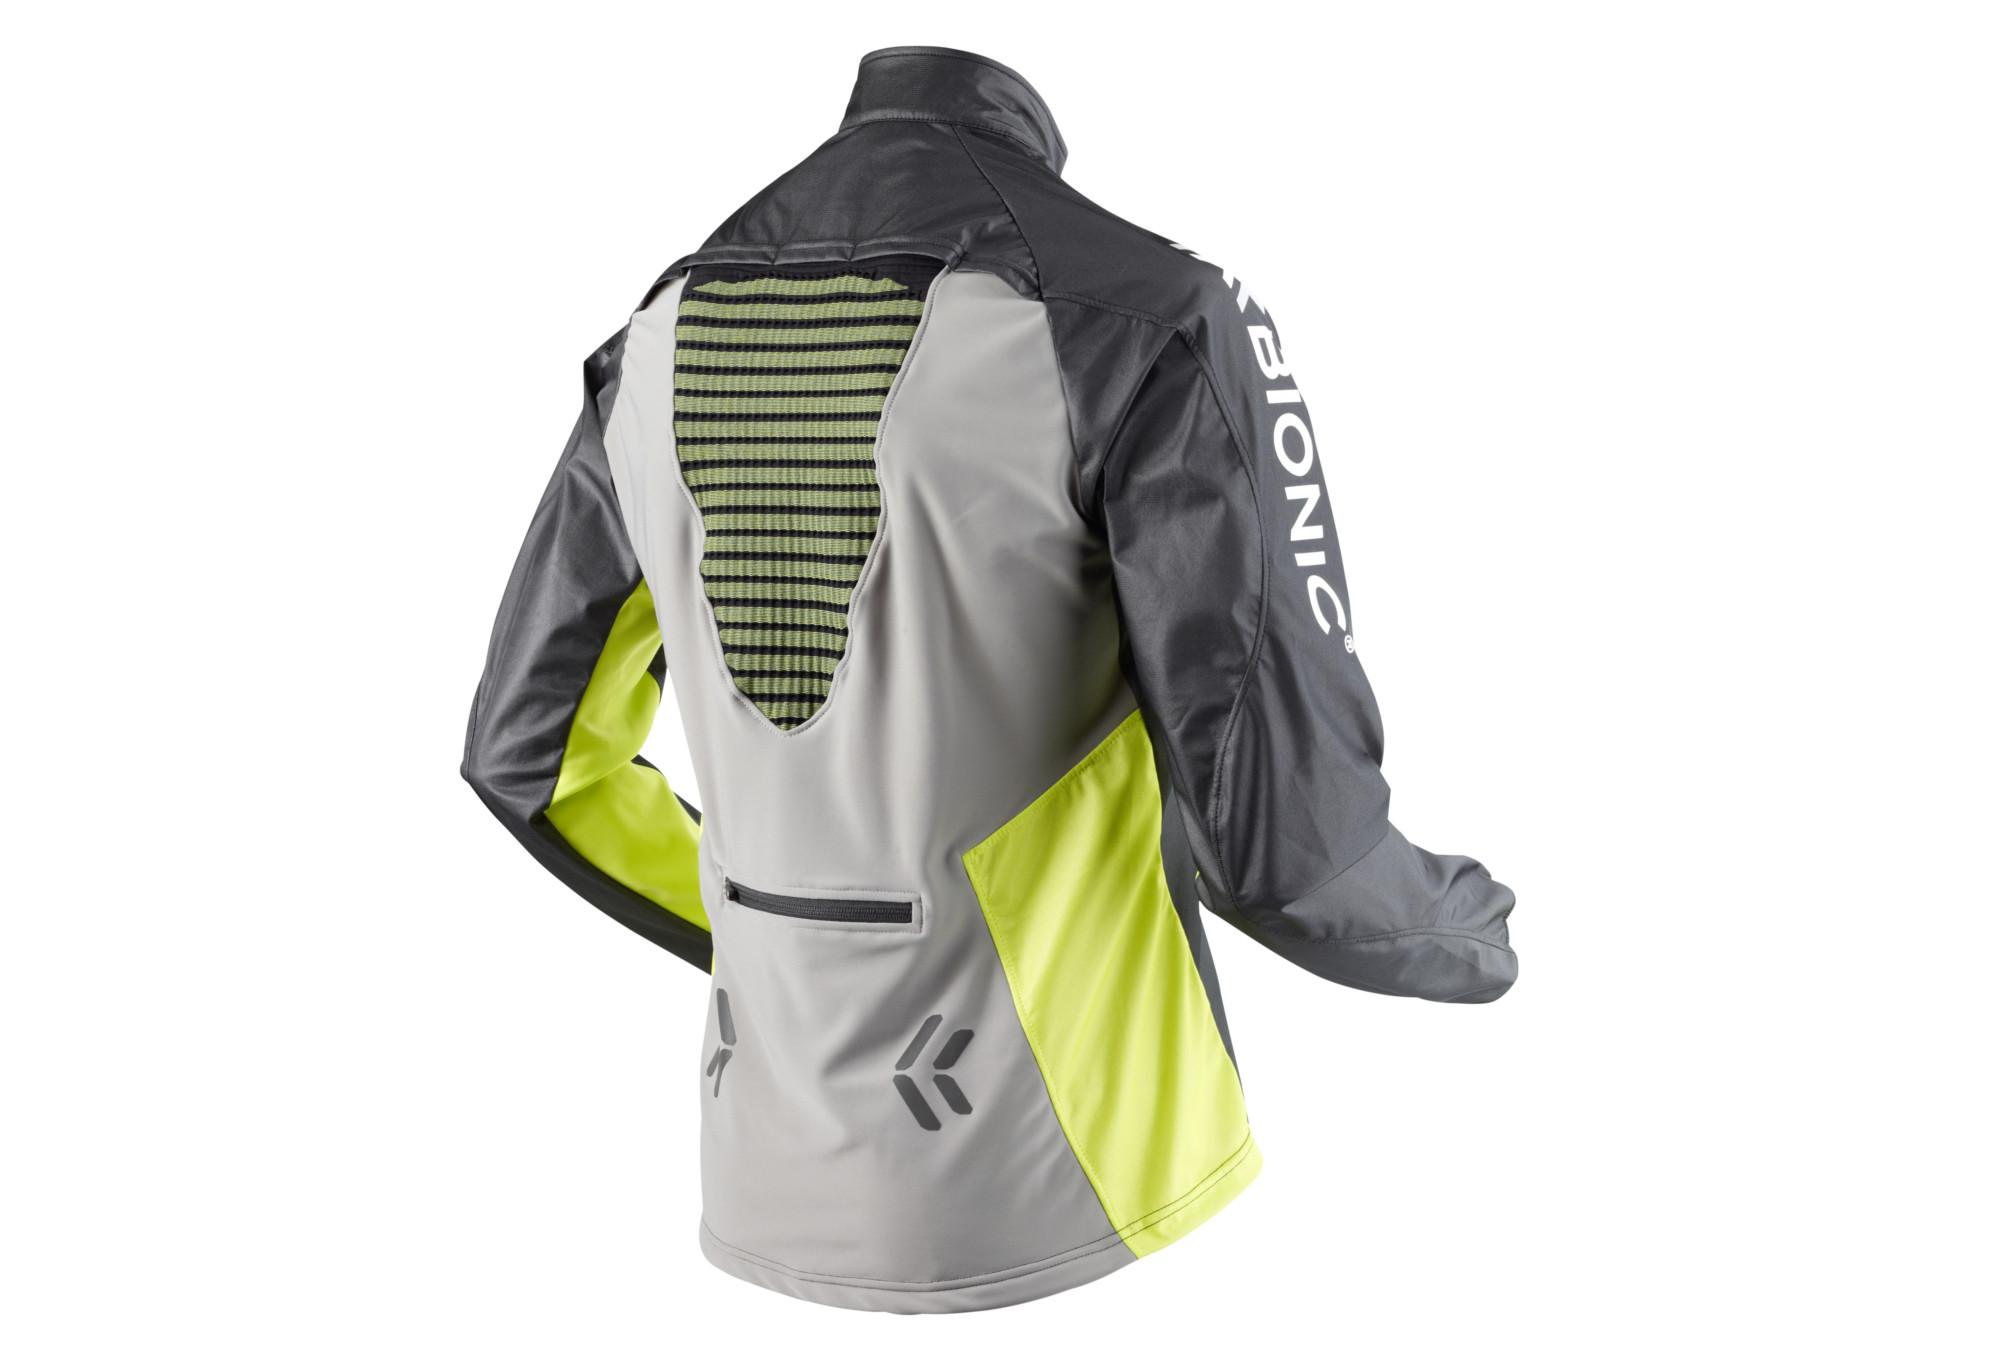 X bionic spherewind jacket test